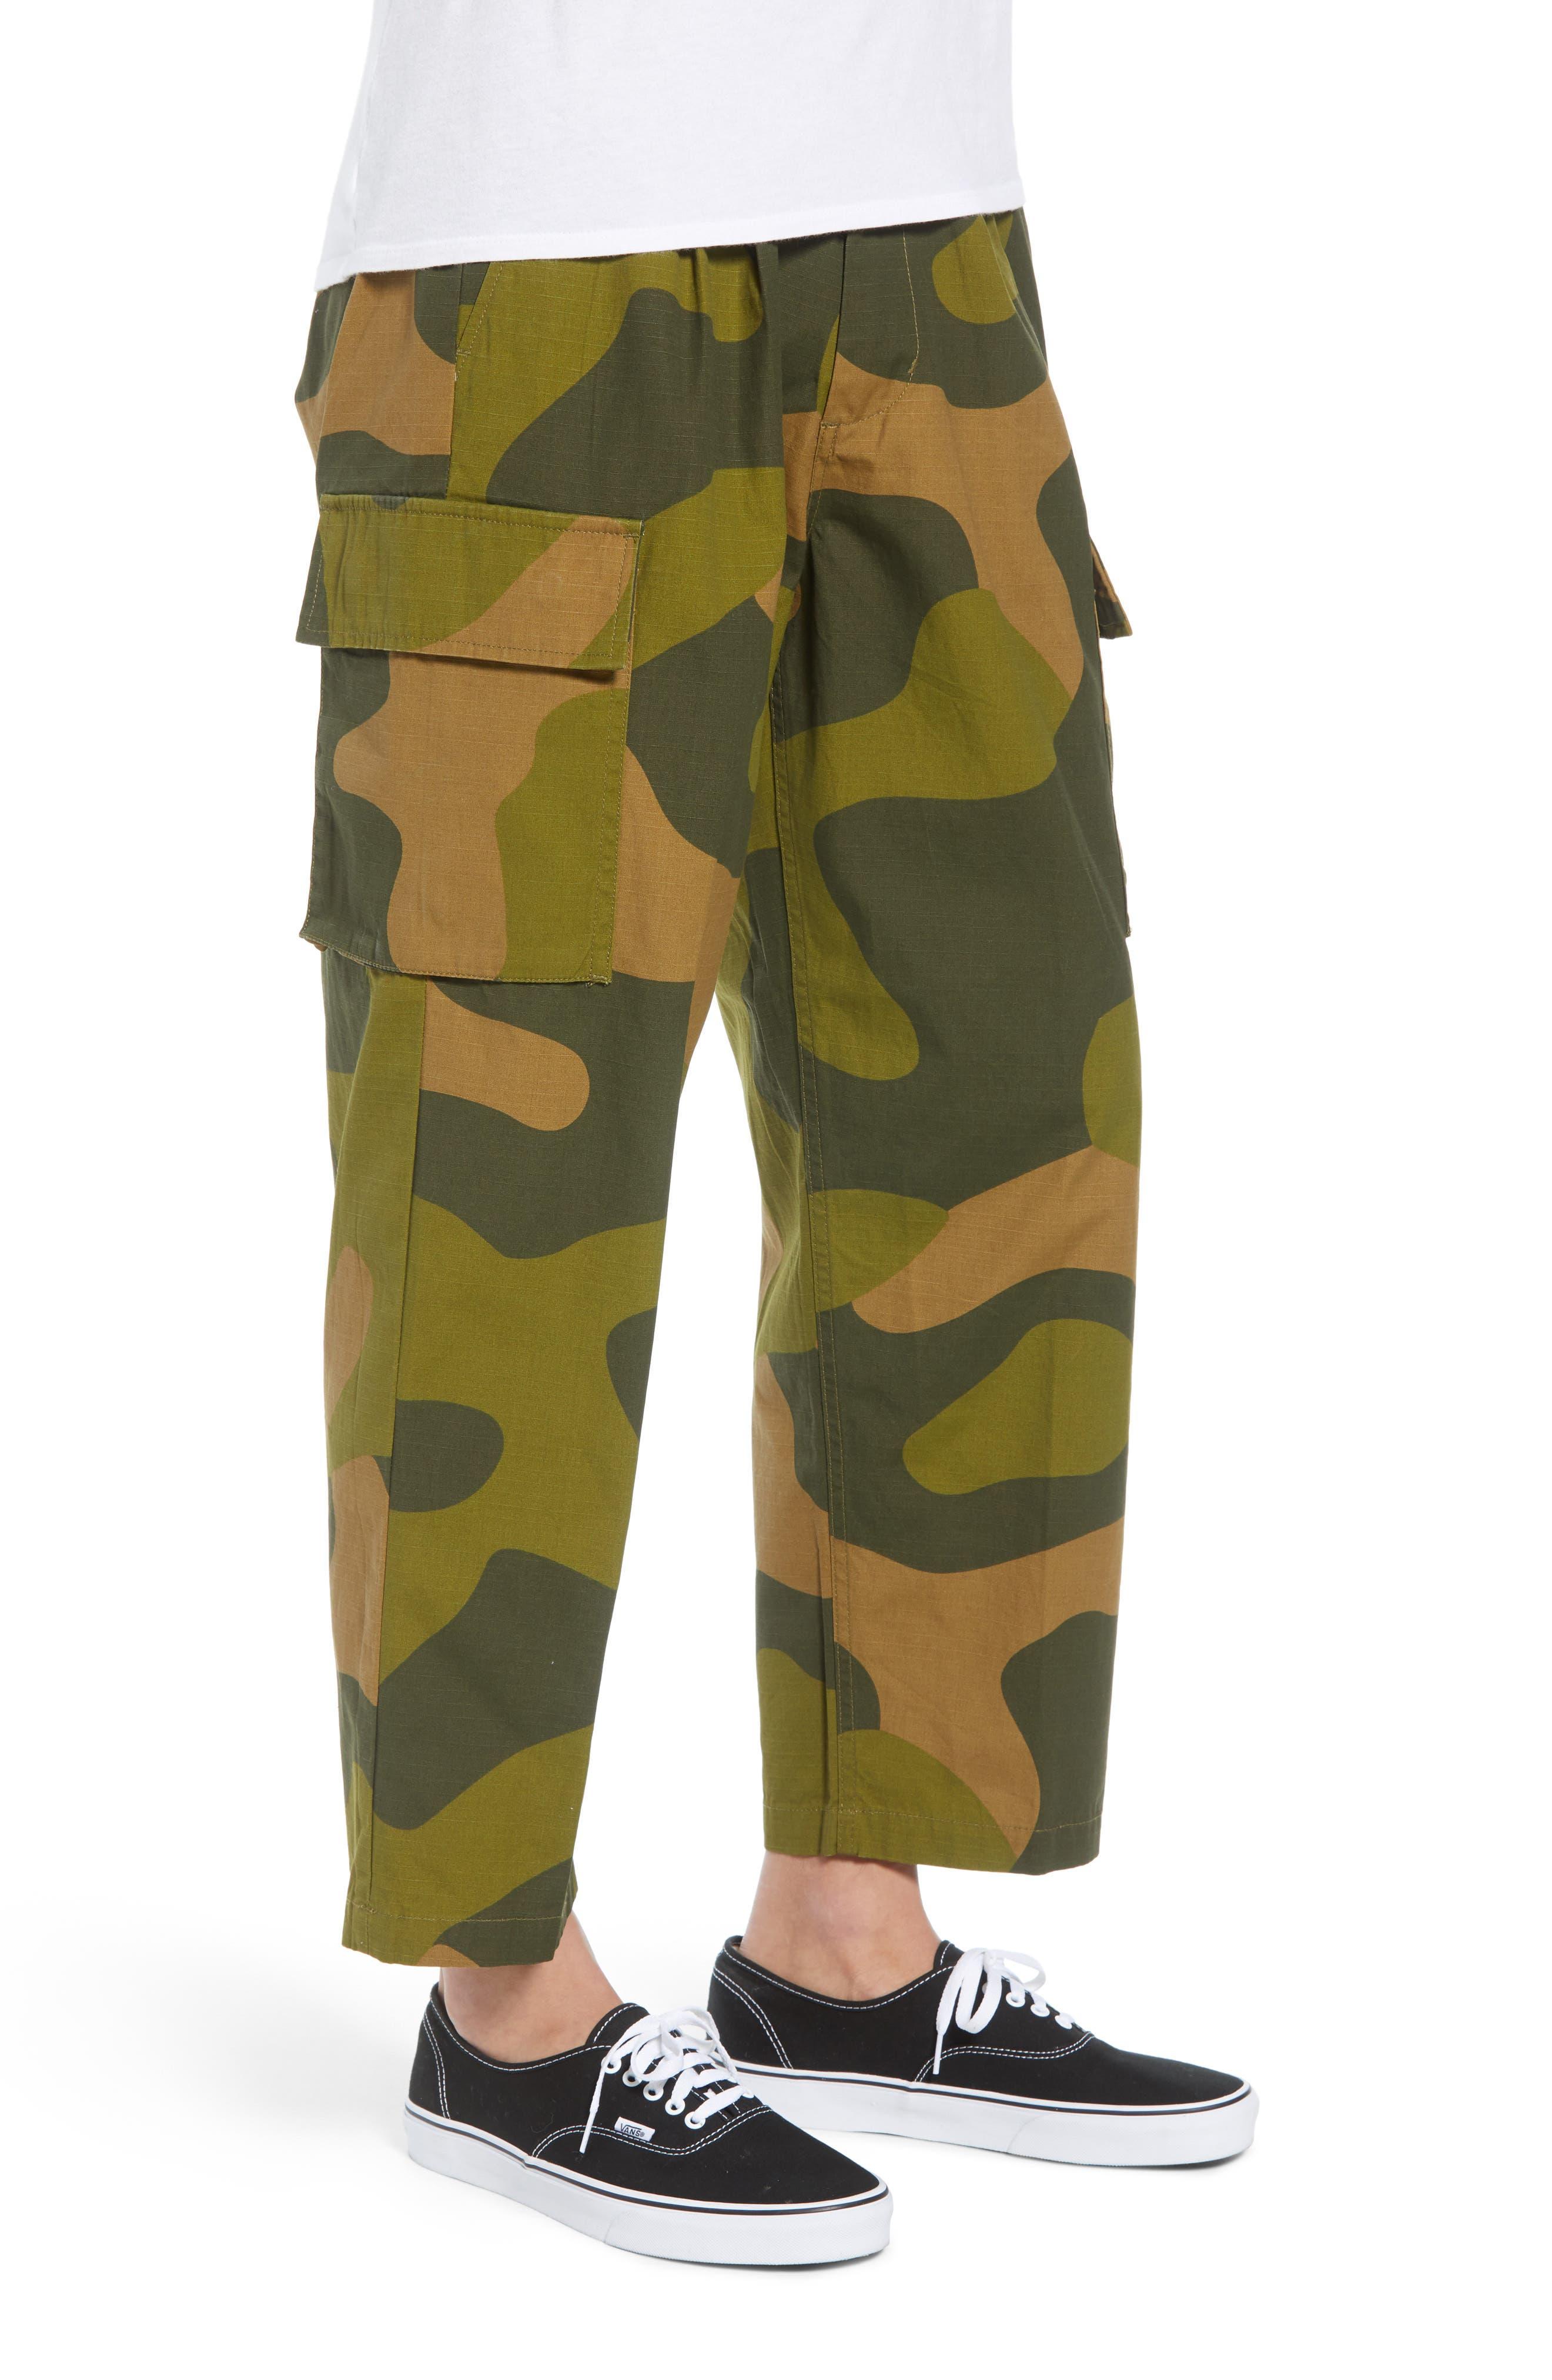 Fubar Relaxed Fit Cargo Pants,                             Alternate thumbnail 3, color,                             305